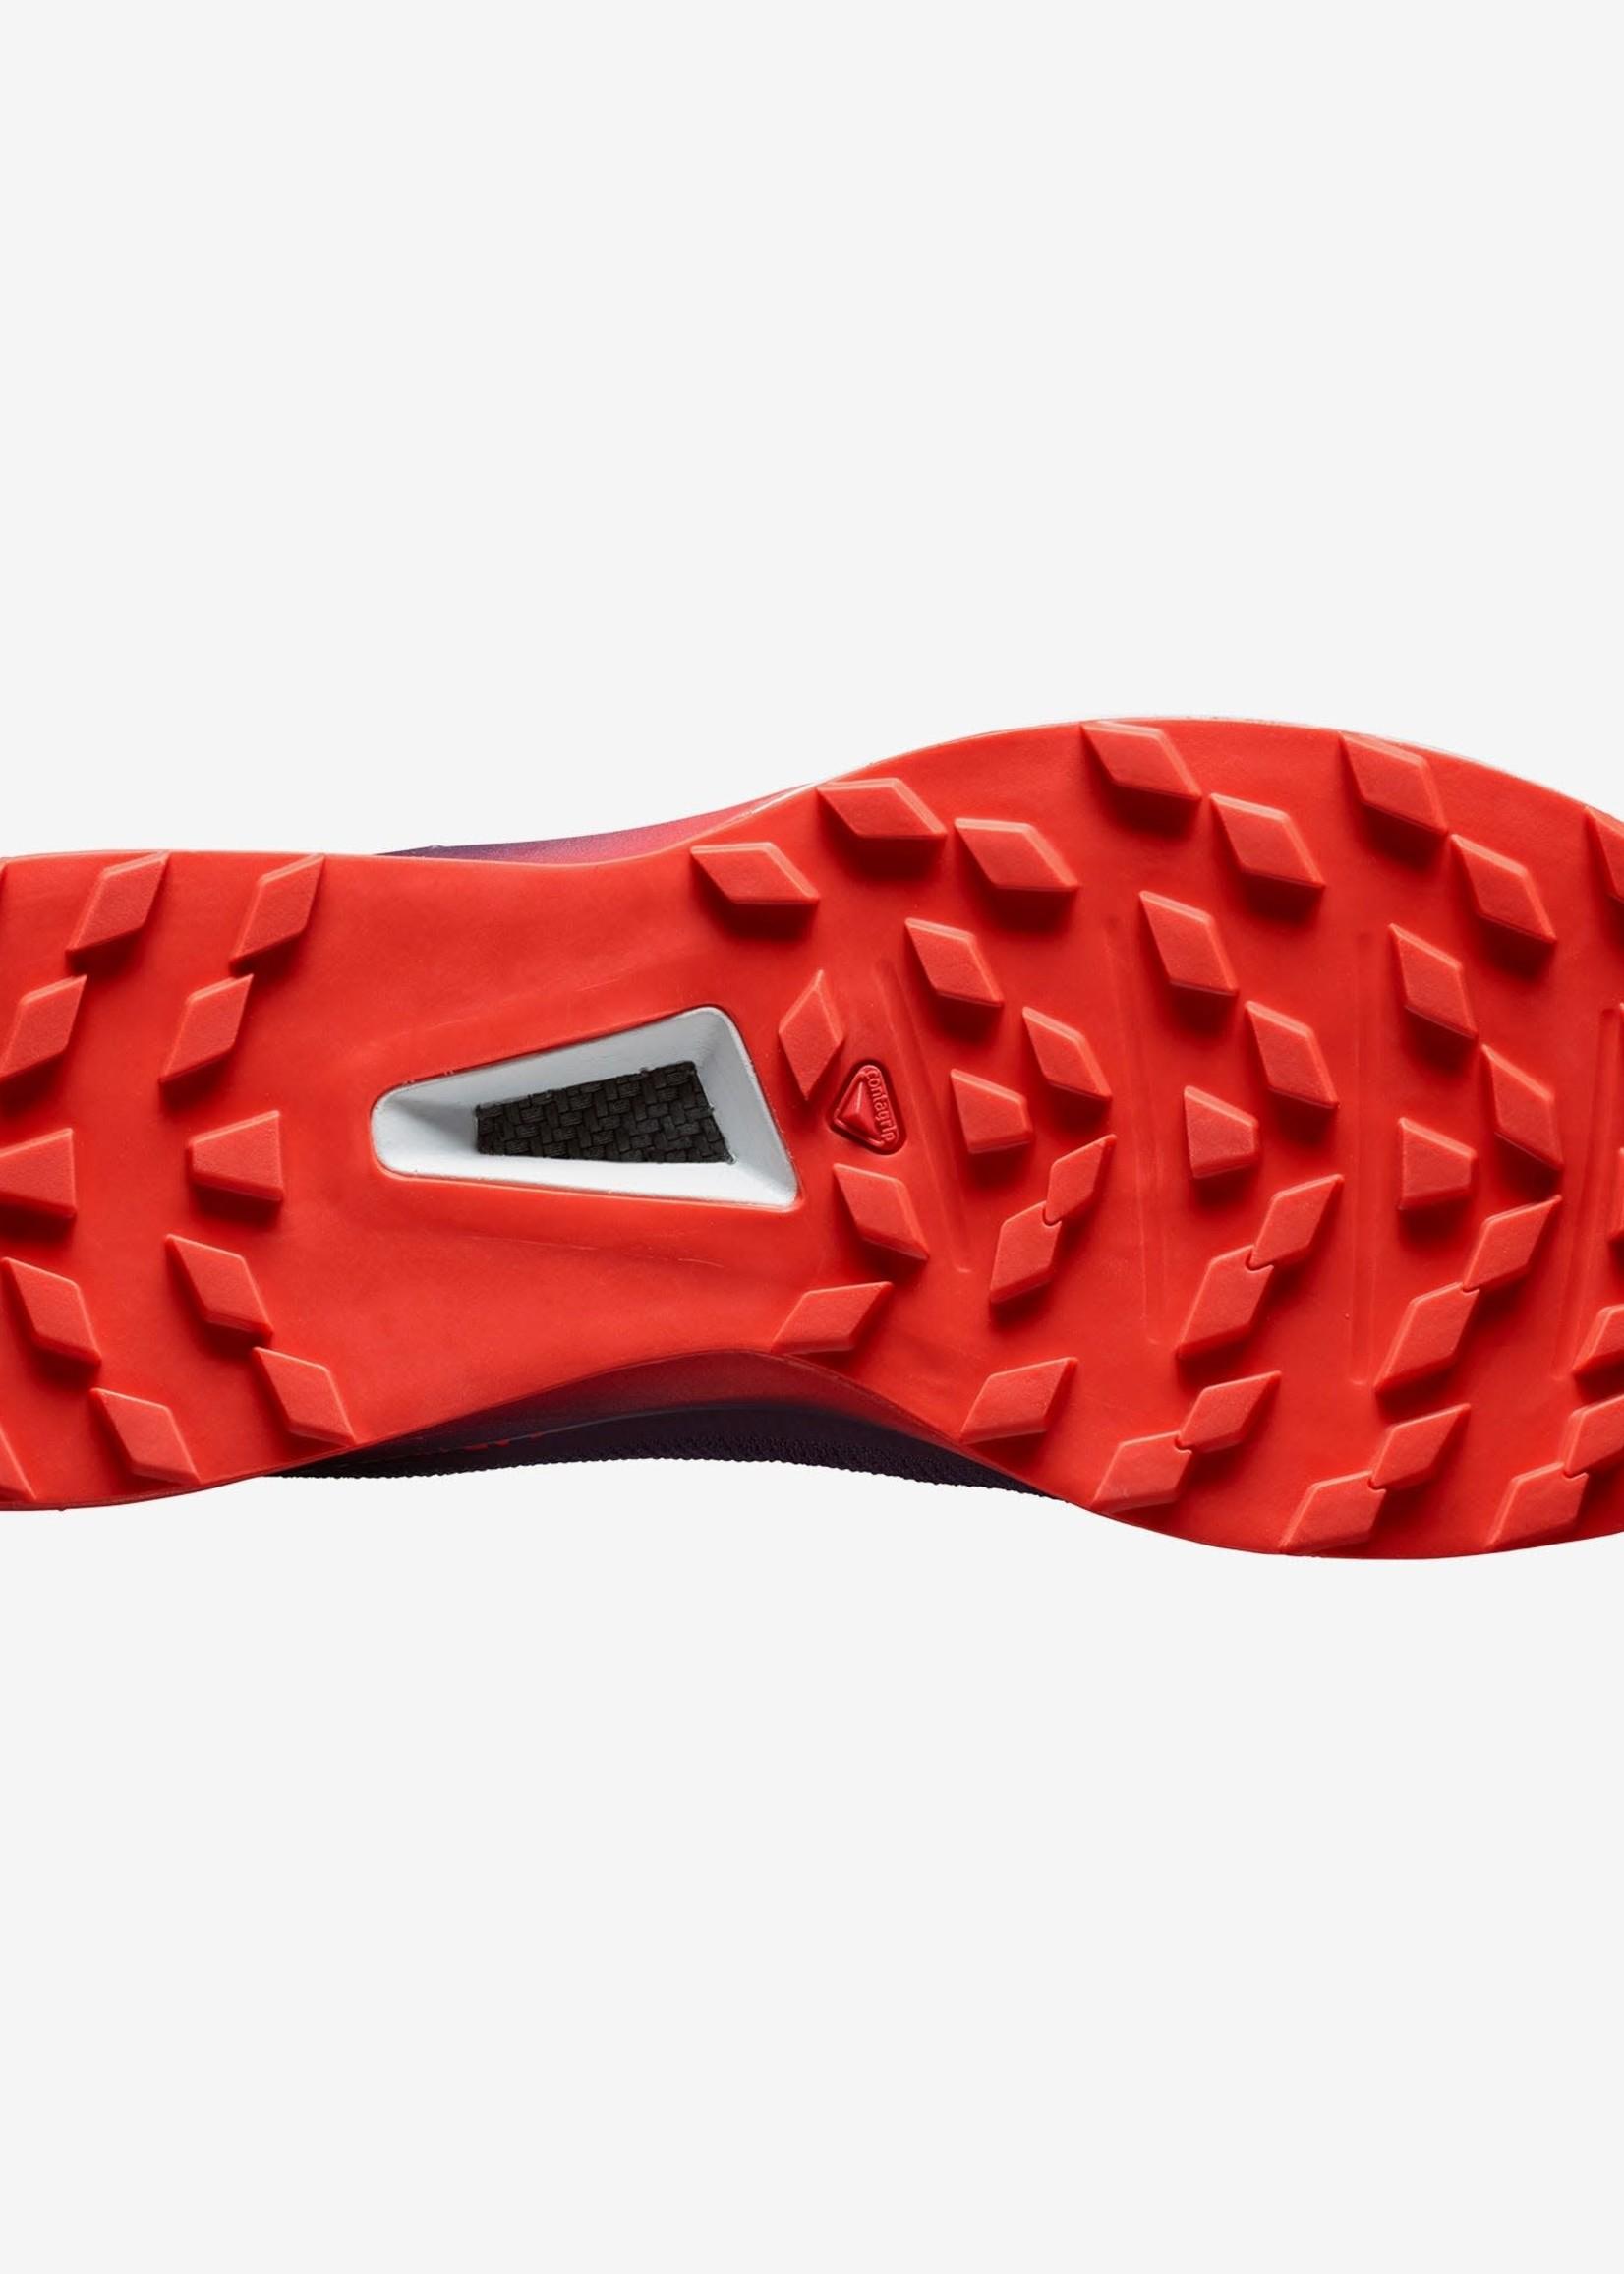 Salomon Salomon S/LAB ULTRA 3 Unisex Trail Running Shoes